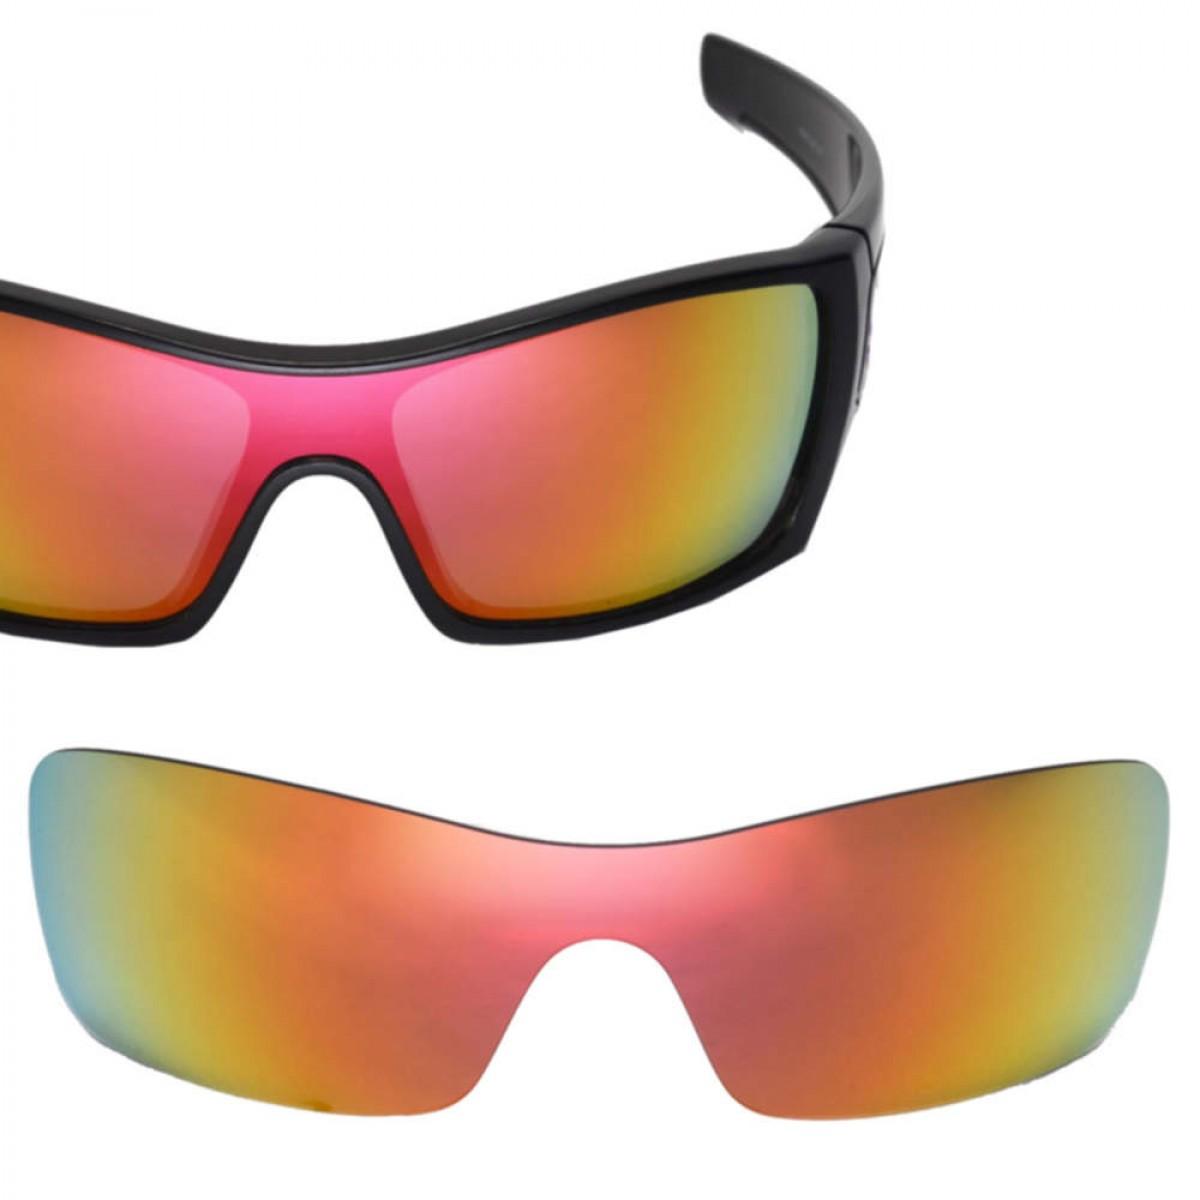 d35ebf4437 Cofery Lenses Store Cofery Replacement Lenses for Oakley Batwolf Sunglasses